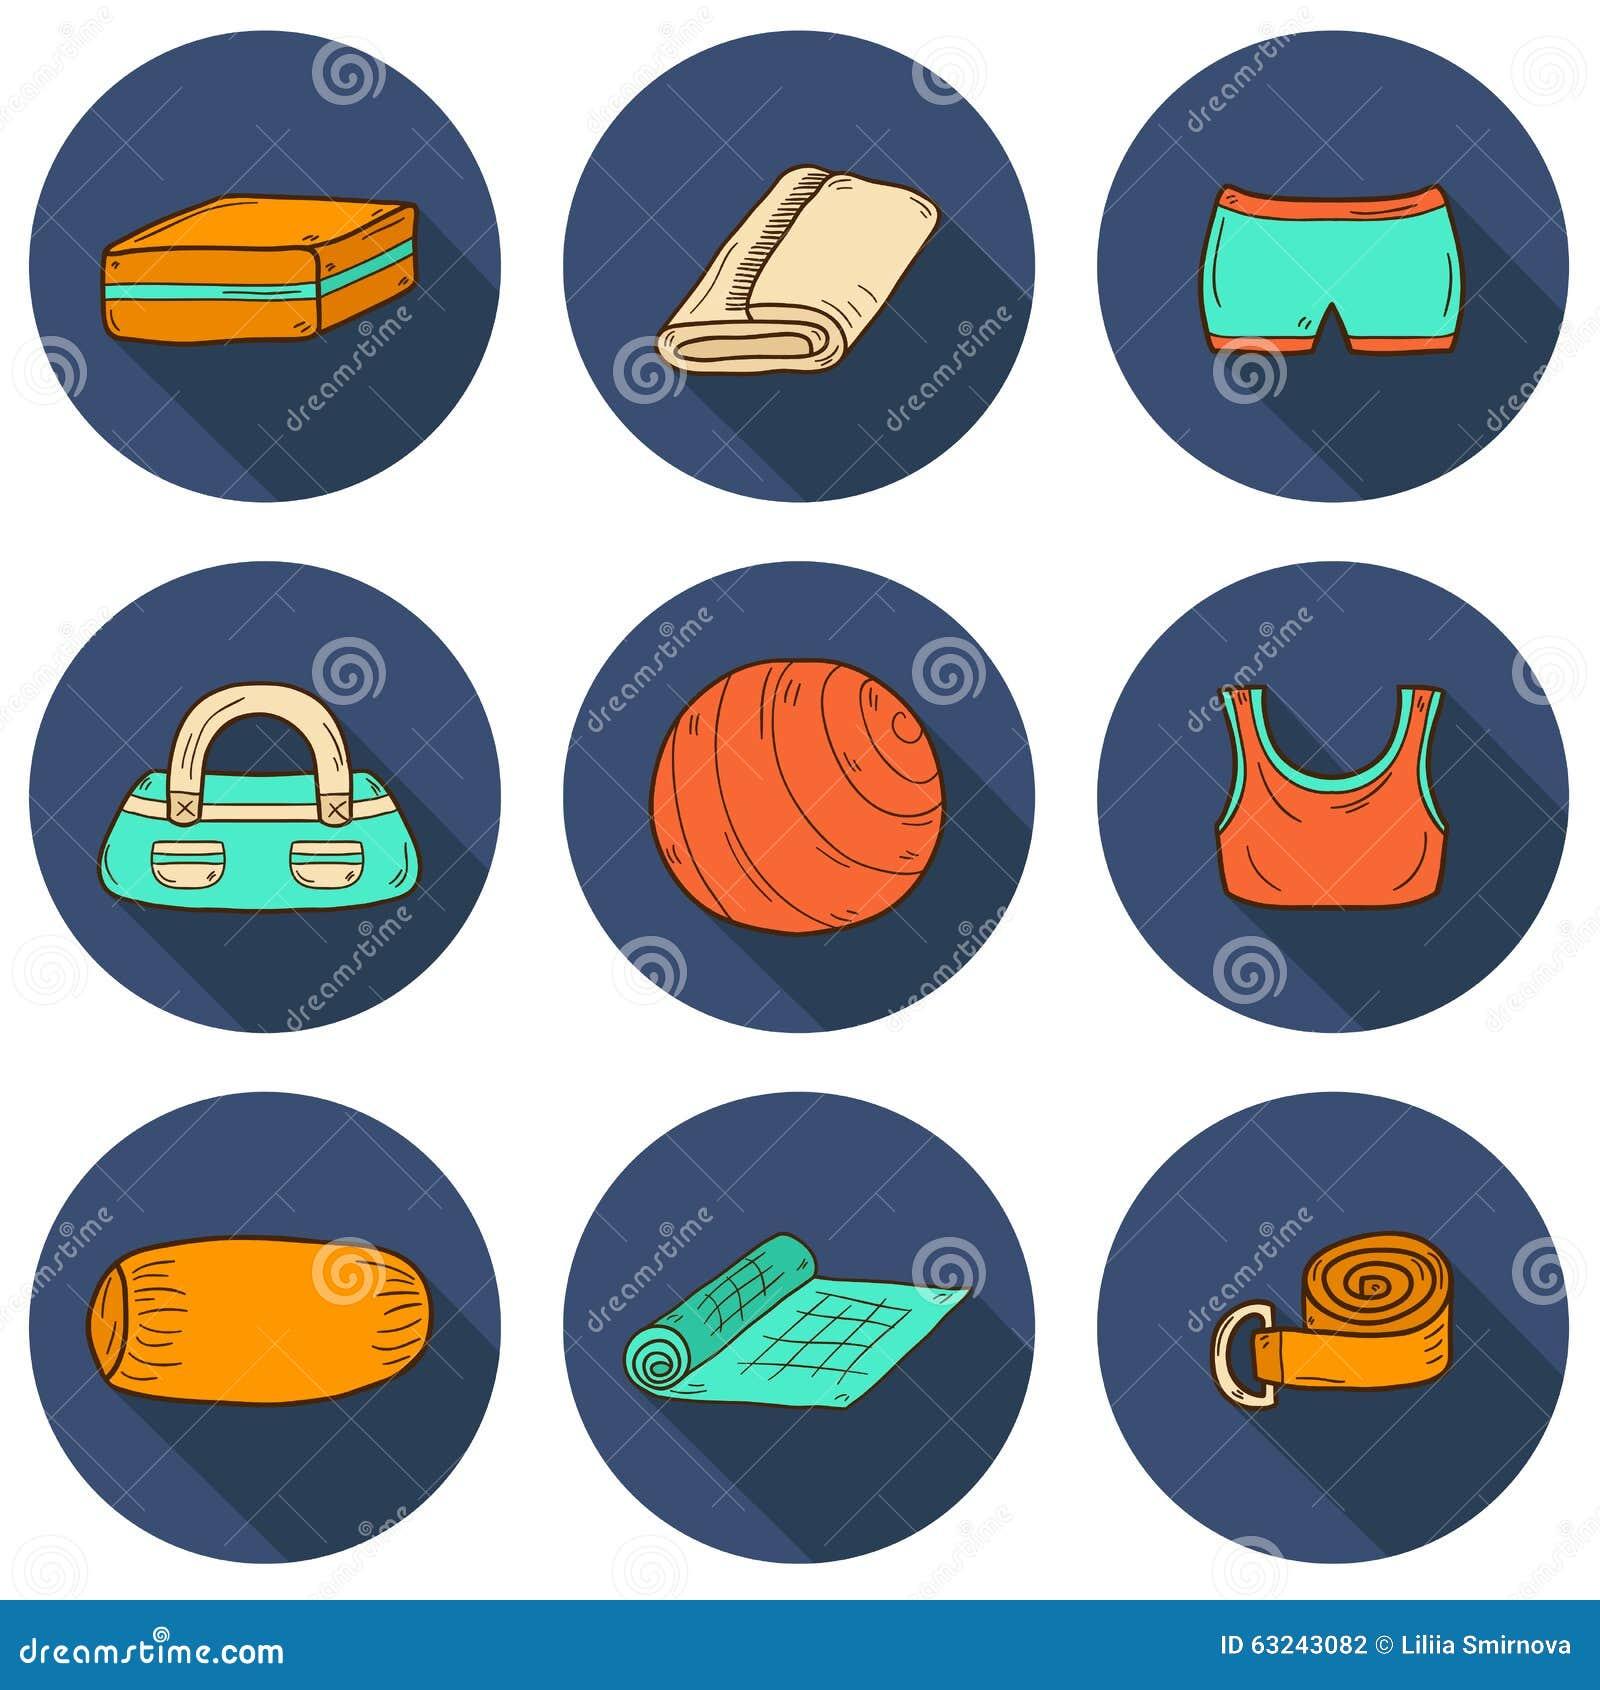 Set Of Yoga Equipment Icons Stock Illustration - Illustration of ... d5b032554